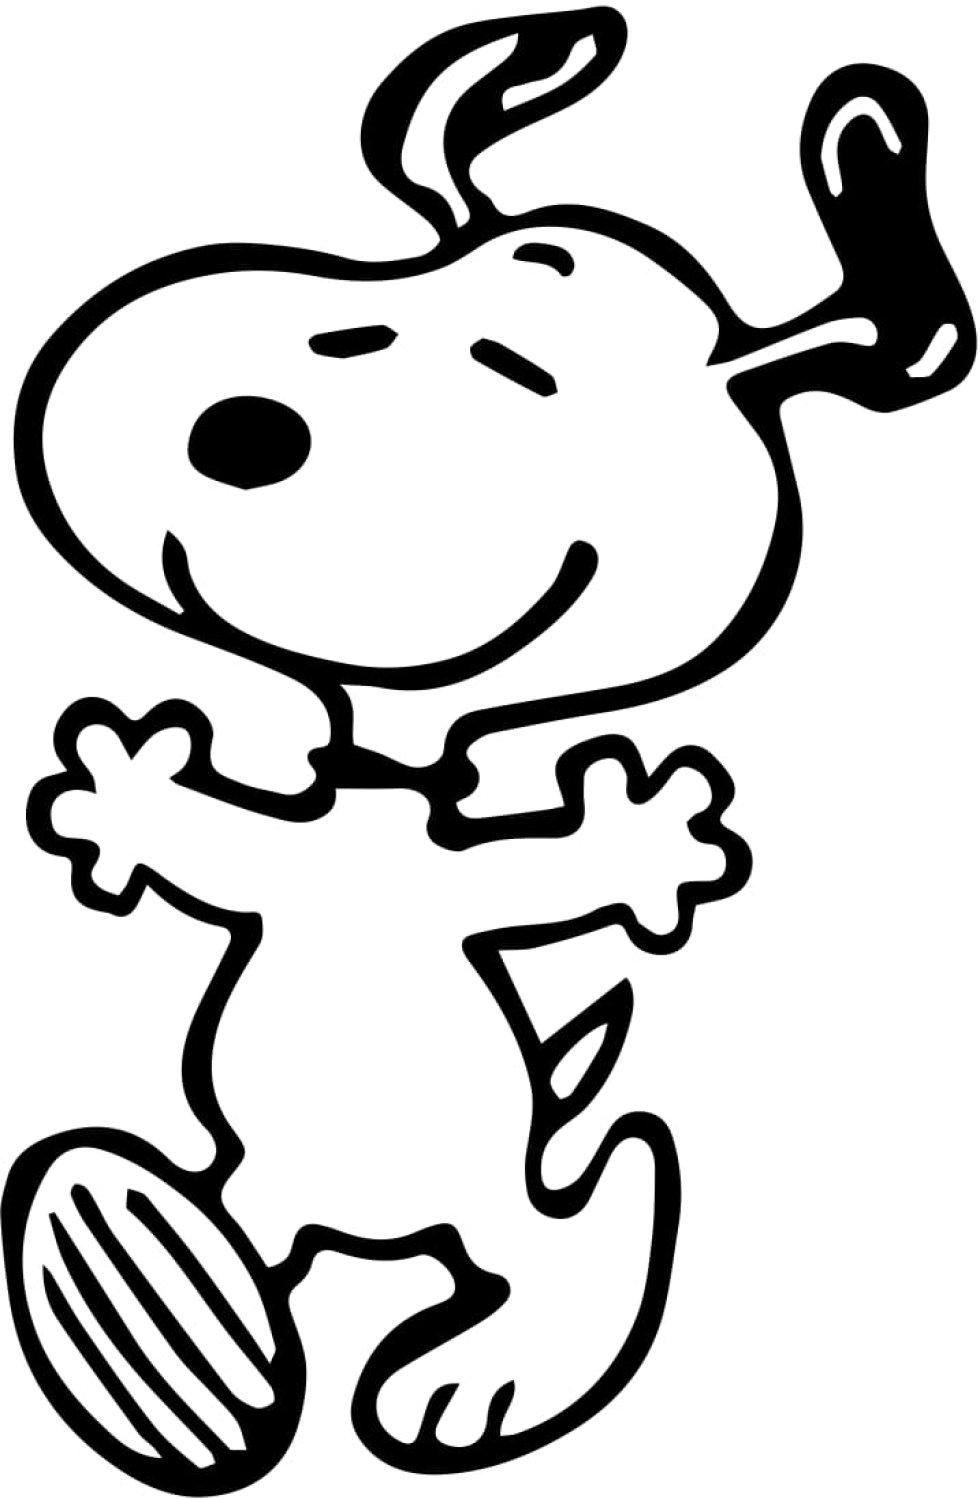 Snoopy (1950)